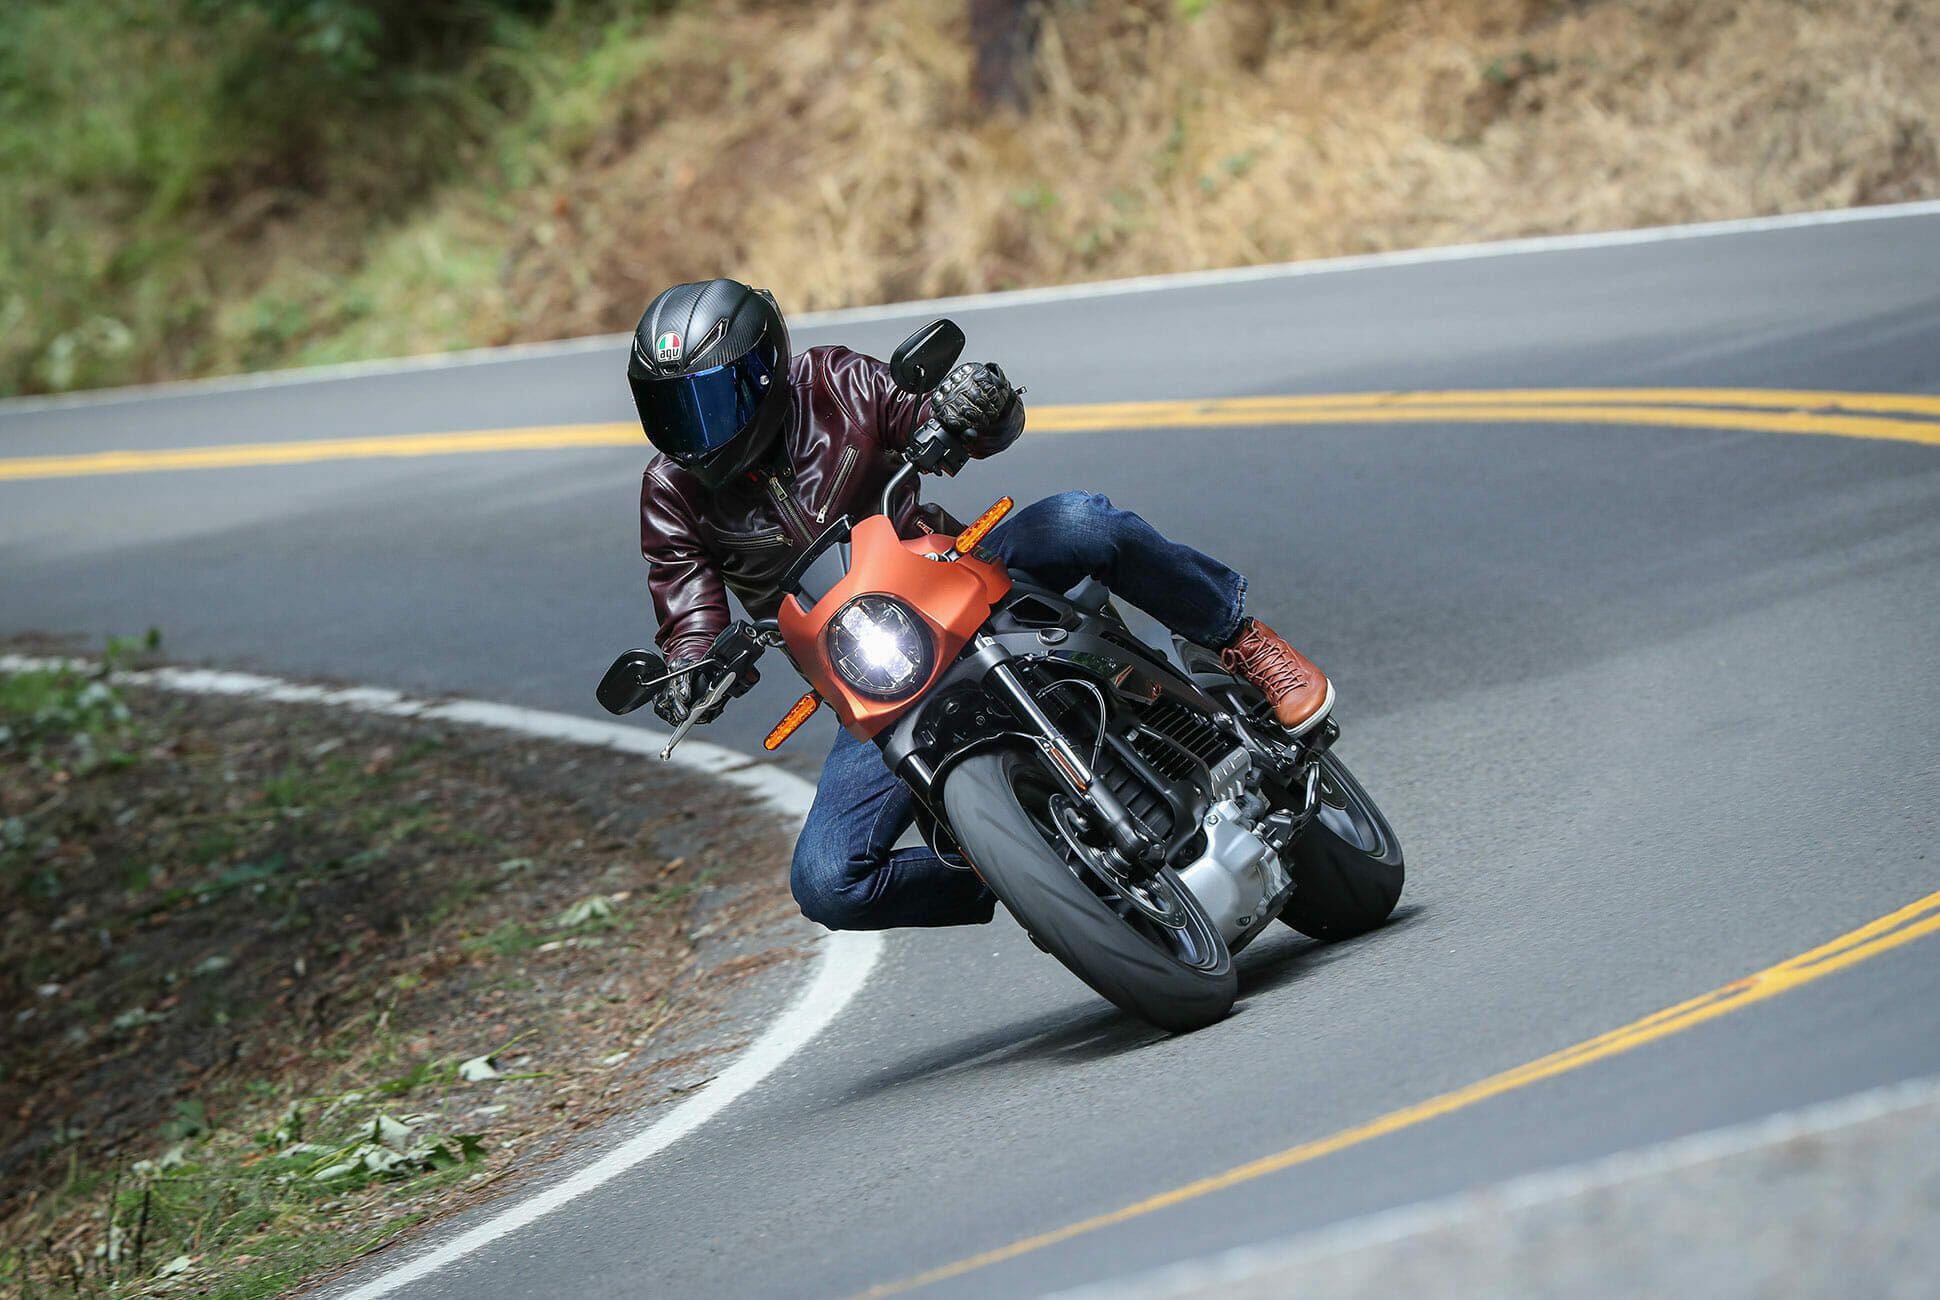 Harley-Davidson-LiveWire-Review-gear-patrol-slide-3